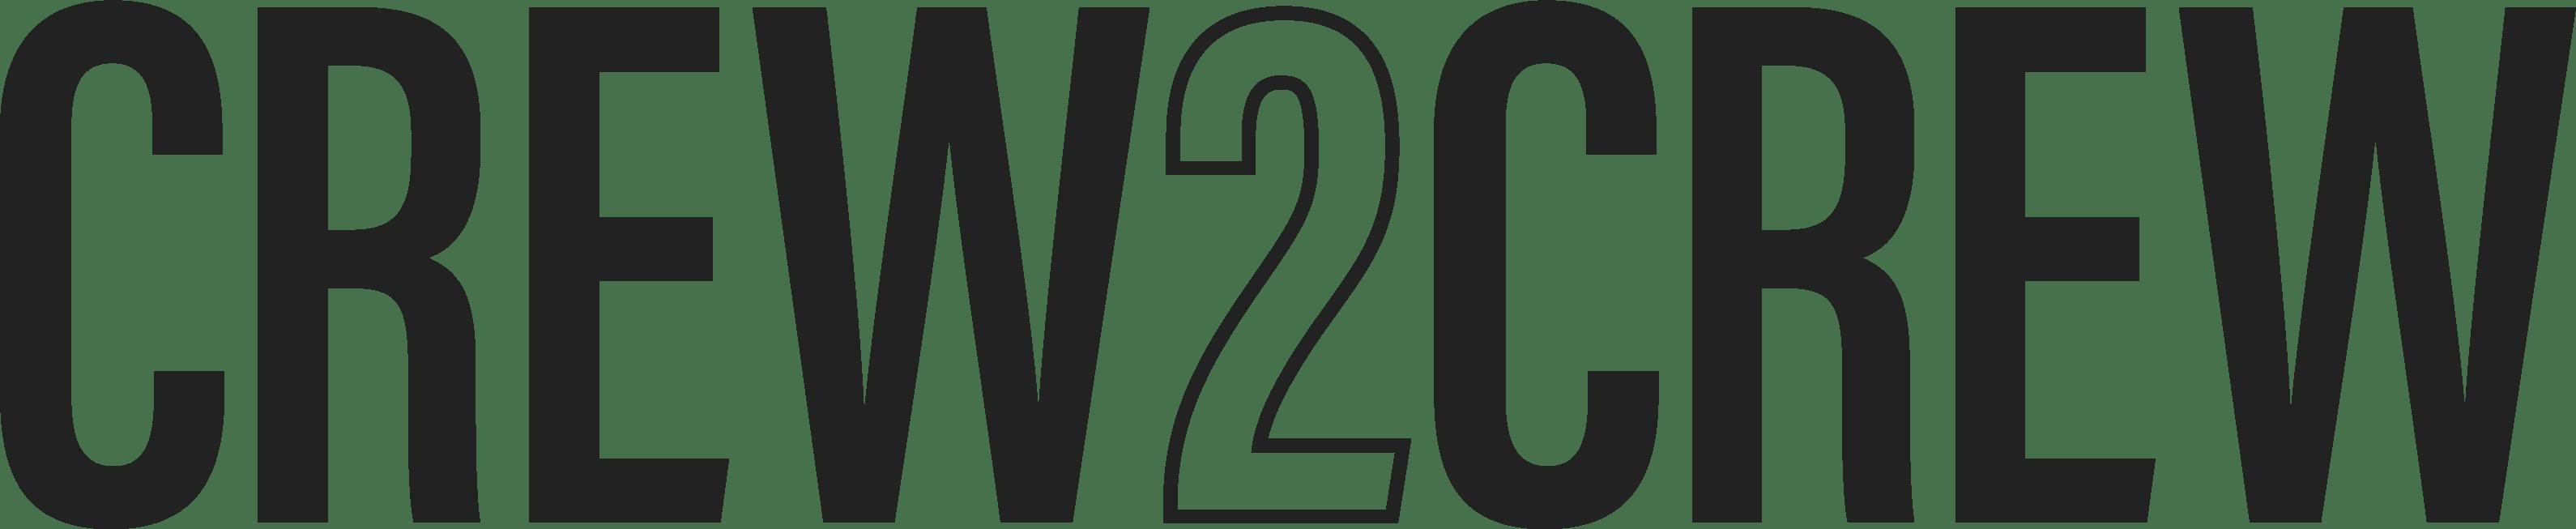 Crew2Crew-Webinars-LOCKUP-2020-dark